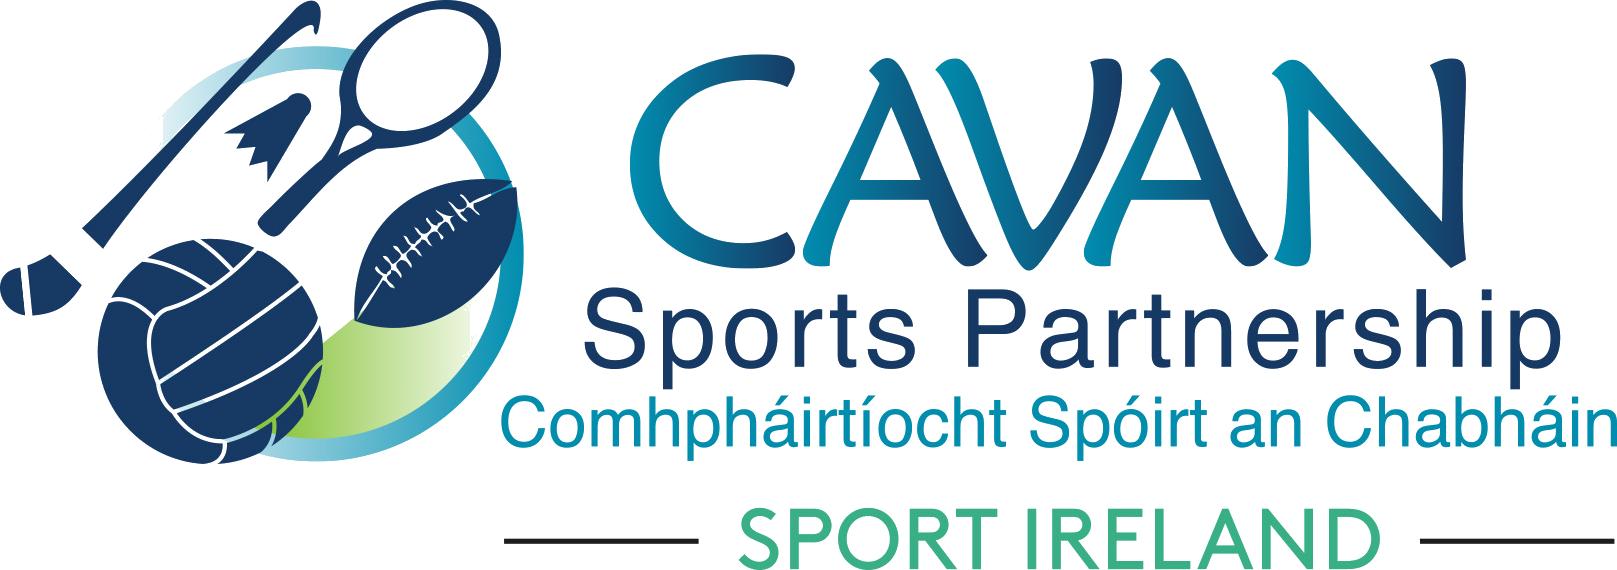 Cavan logo